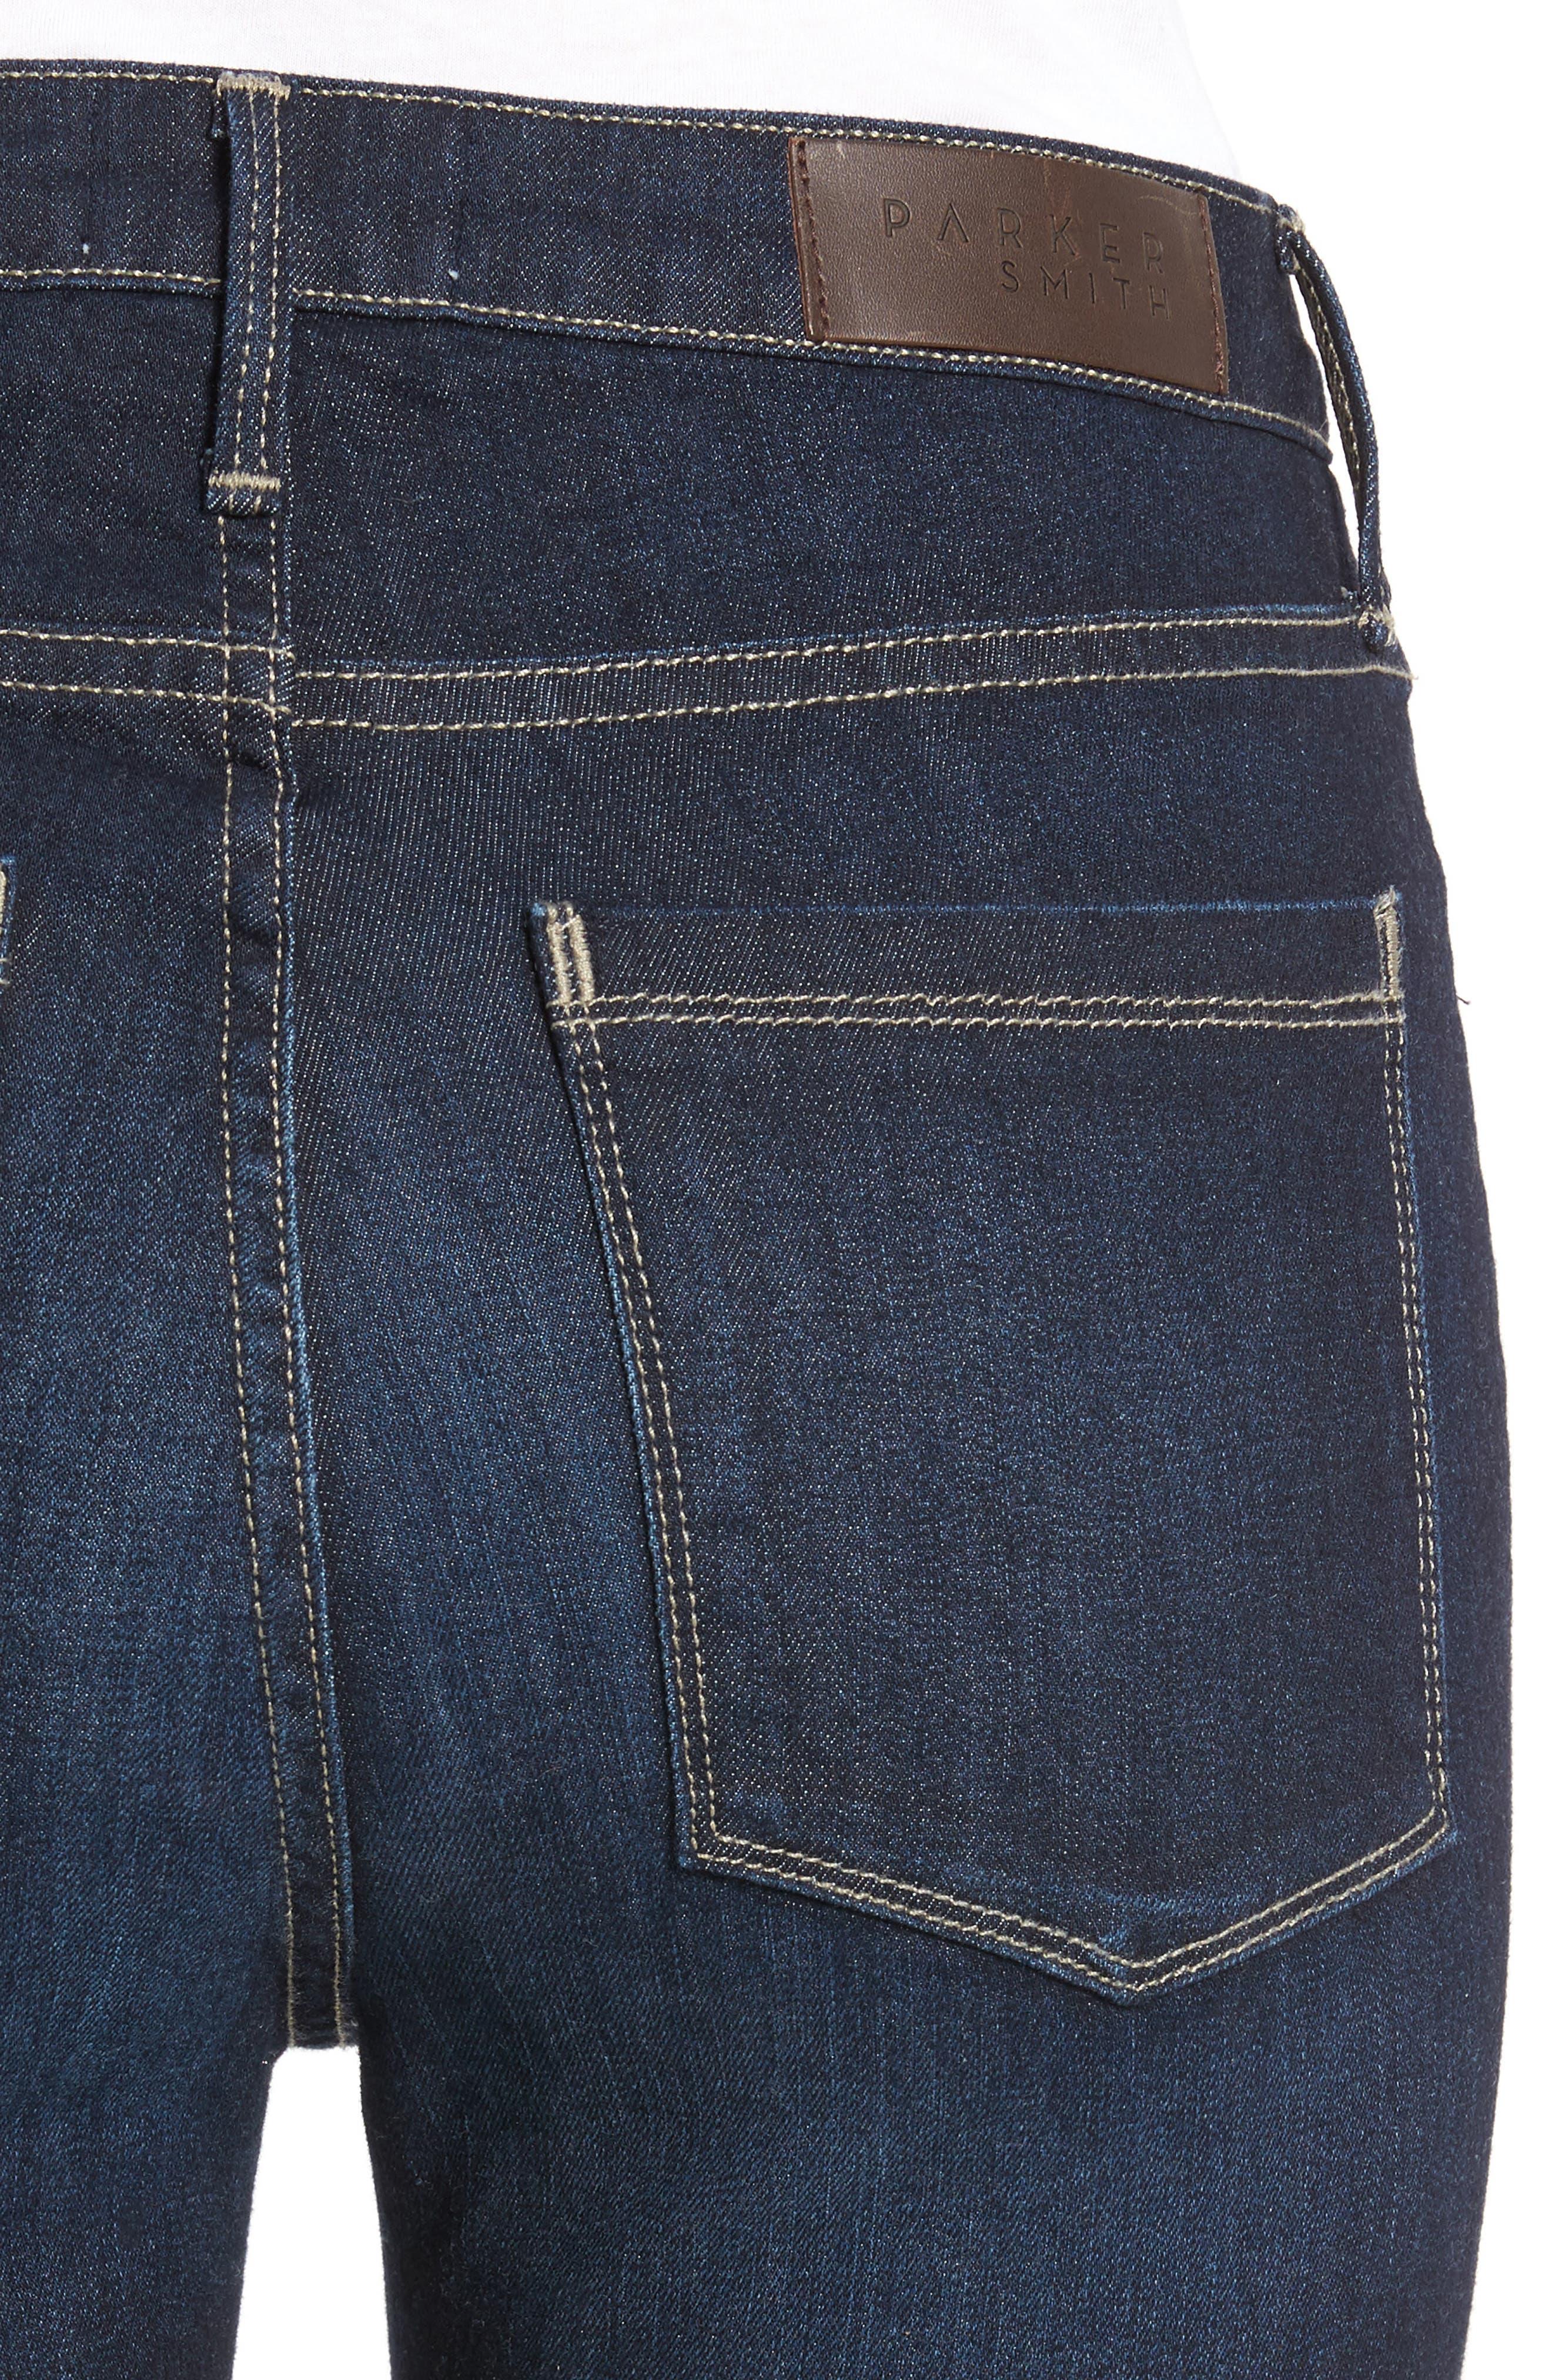 Bombshell Raw Hem Stretch Skinny Jeans,                             Alternate thumbnail 4, color,                             Horizon